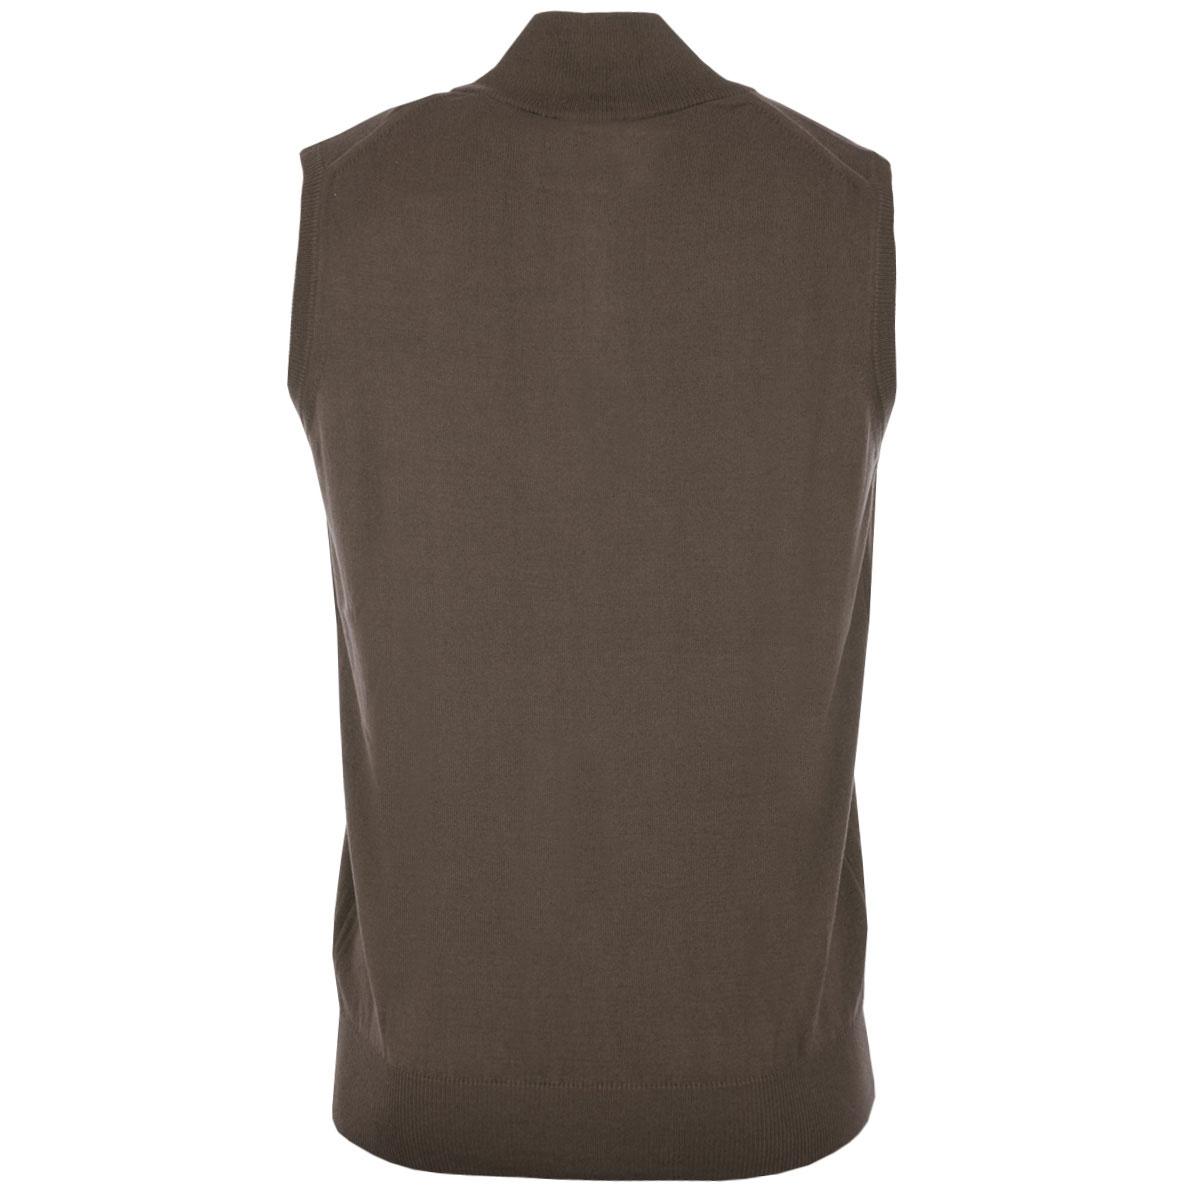 Calvin-Klein-Golf-Mens-CK-1-4-Zip-Sleeveless-Sweater-Vest-Gilet-27-OFF-RRP thumbnail 13